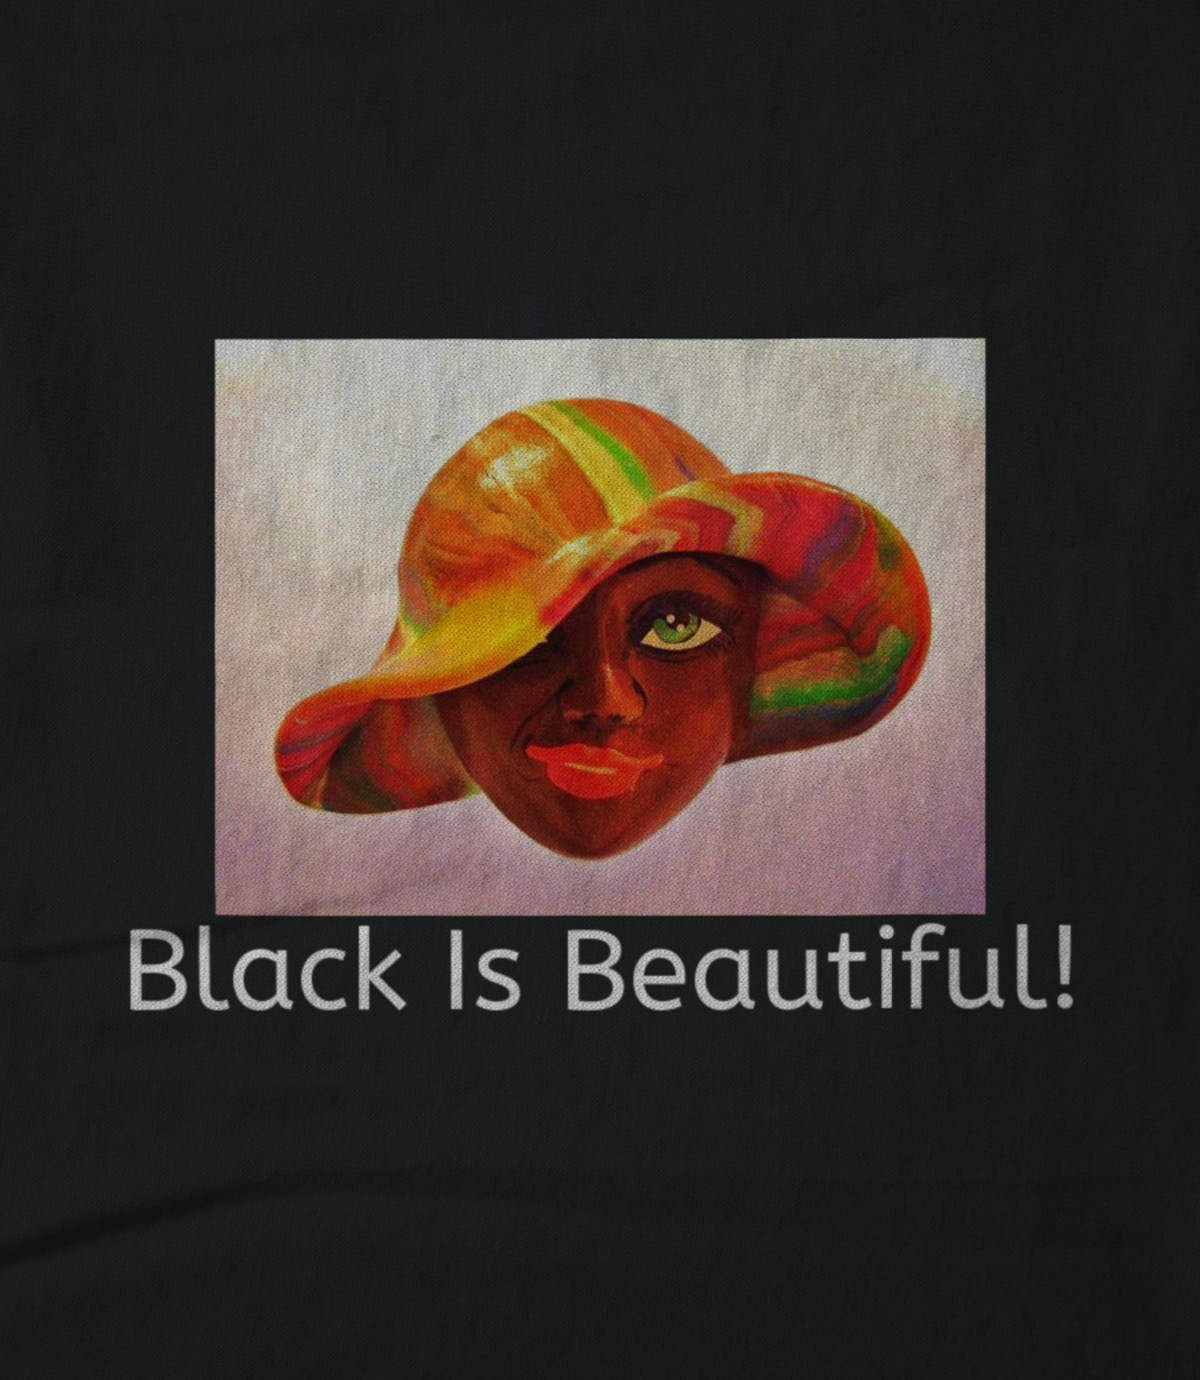 Matthew f  blowers iii  c  2014 black is beautiful  1505948296